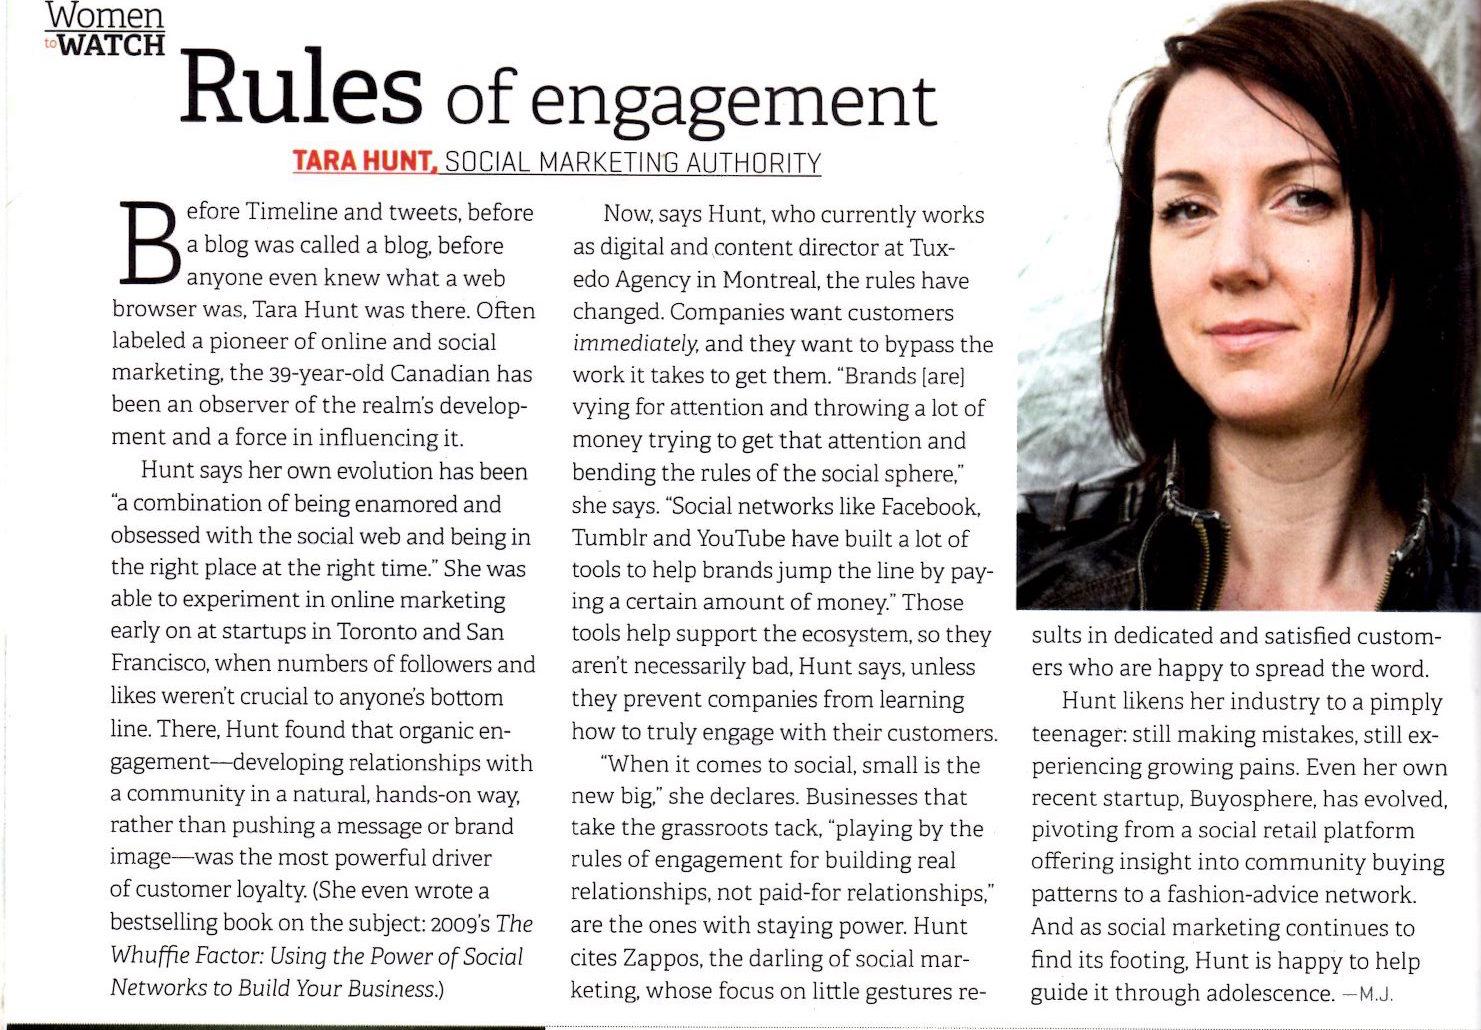 rulesofengagement.jpg